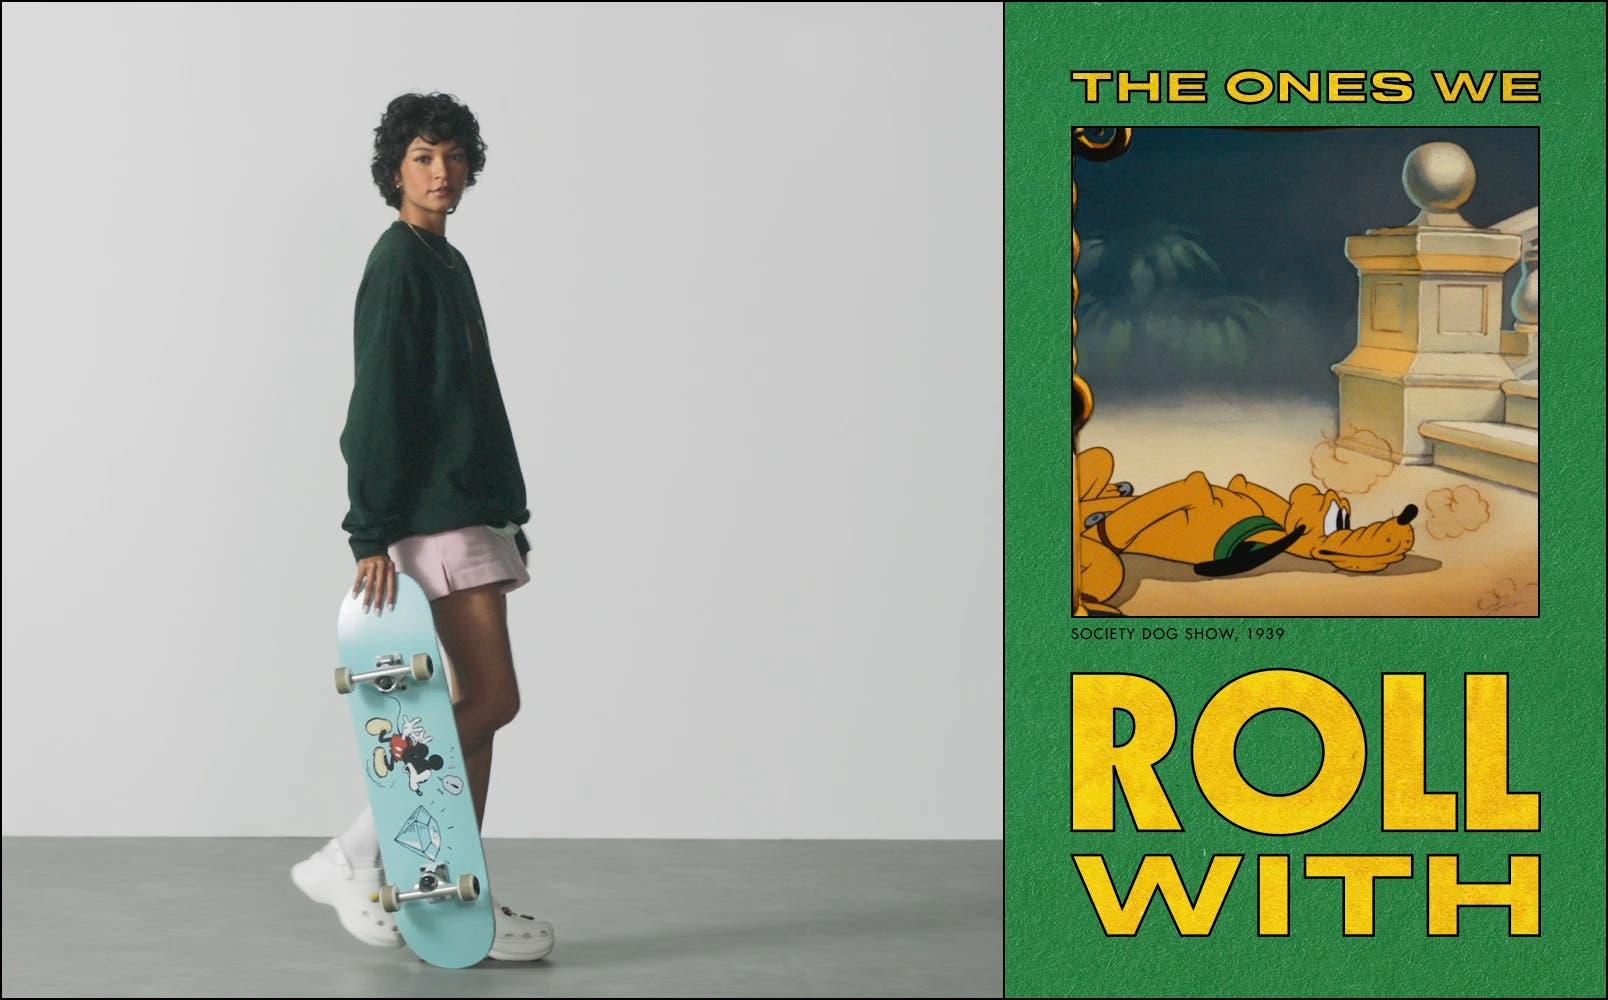 Video of model in Goofy sweatshirt riding Disney skateboard; video of Pluto on roller skates.